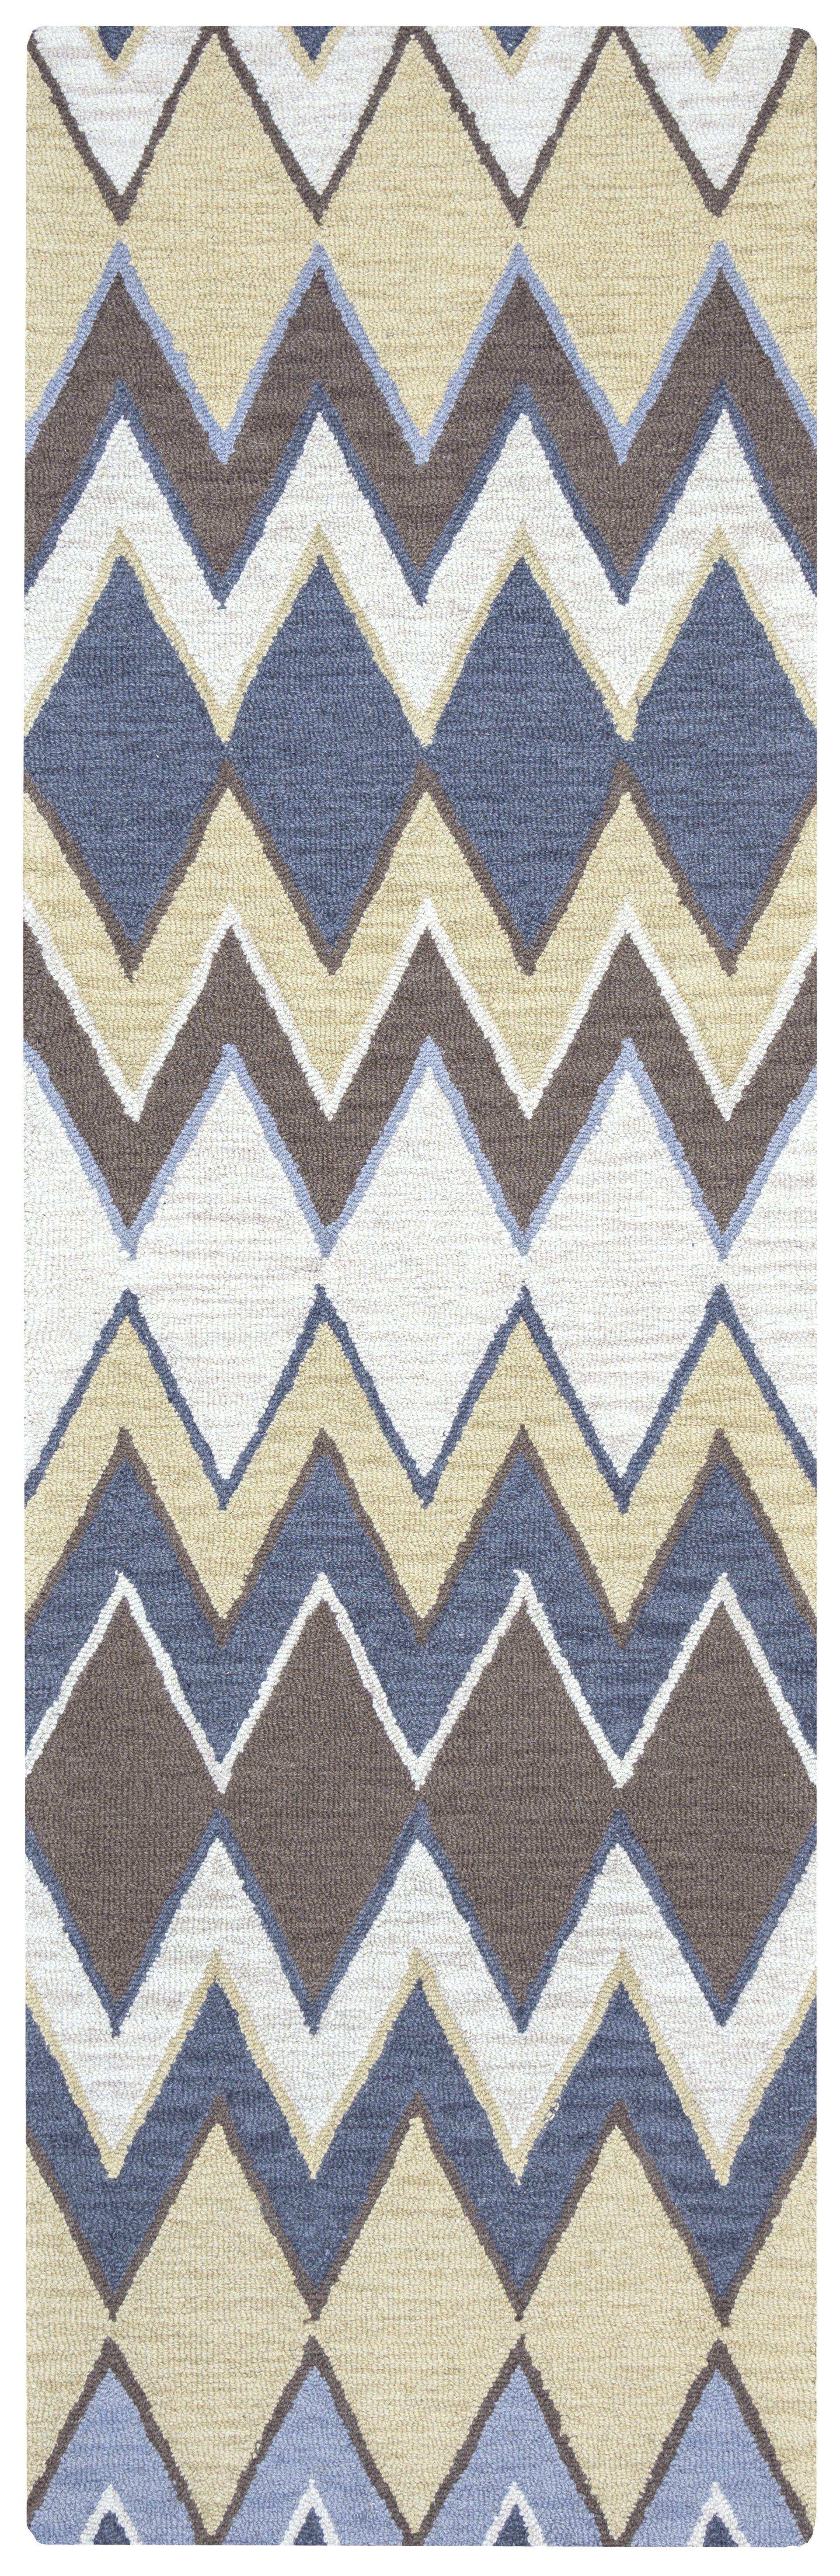 Eldora Hand-Tufted Light Gray Area Rug Rug Size: Rectangle 10' x 14'